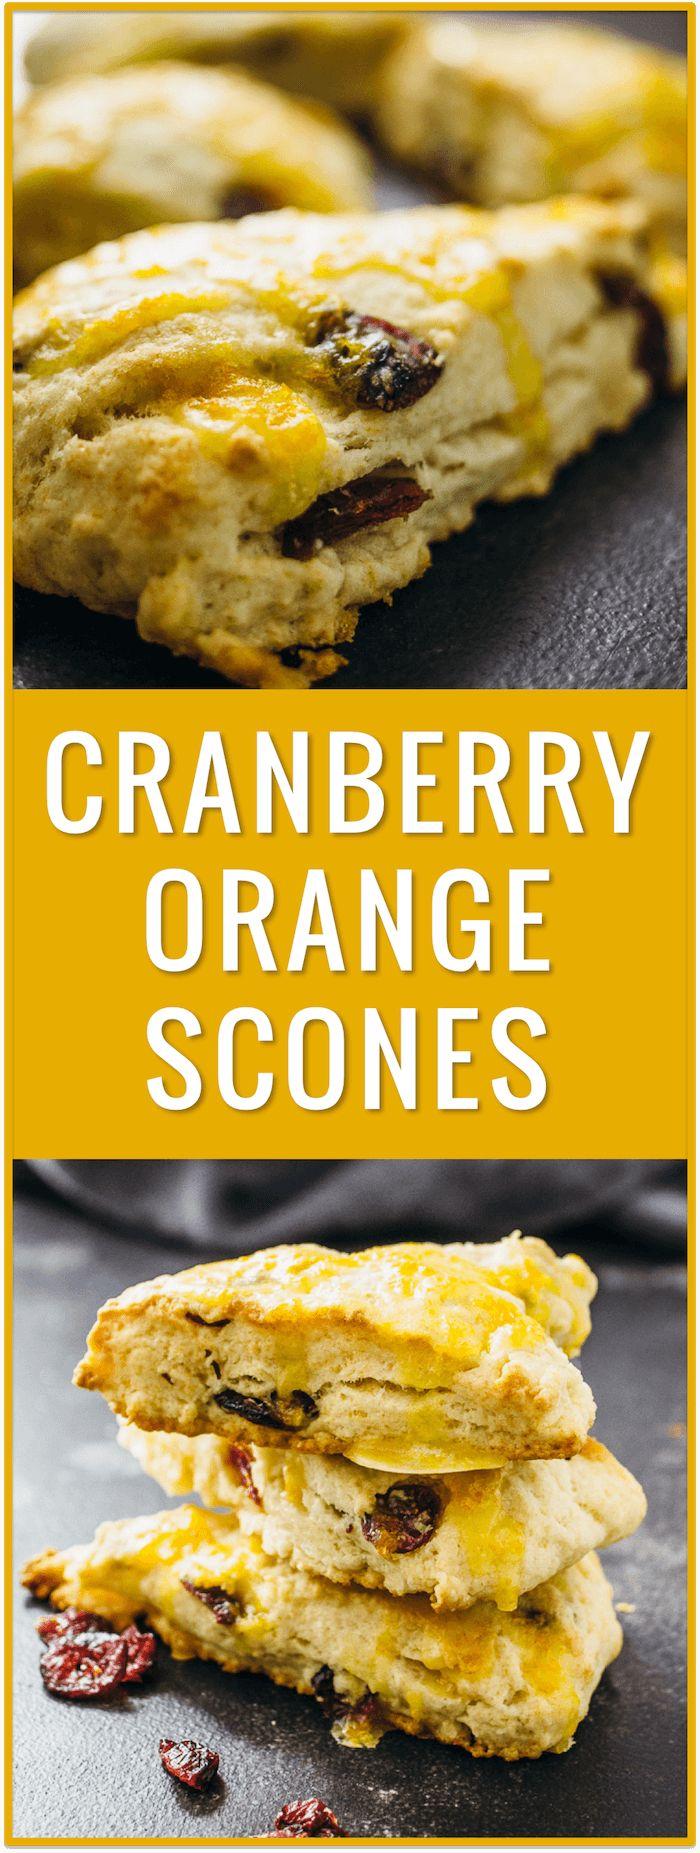 best cranberry orange scones, healthy, fresh fruit, baked, orange zest, orange glaze, thanksgiving, christmas, breakfast, brunch, morning, pastry, dessert via @savory_tooth